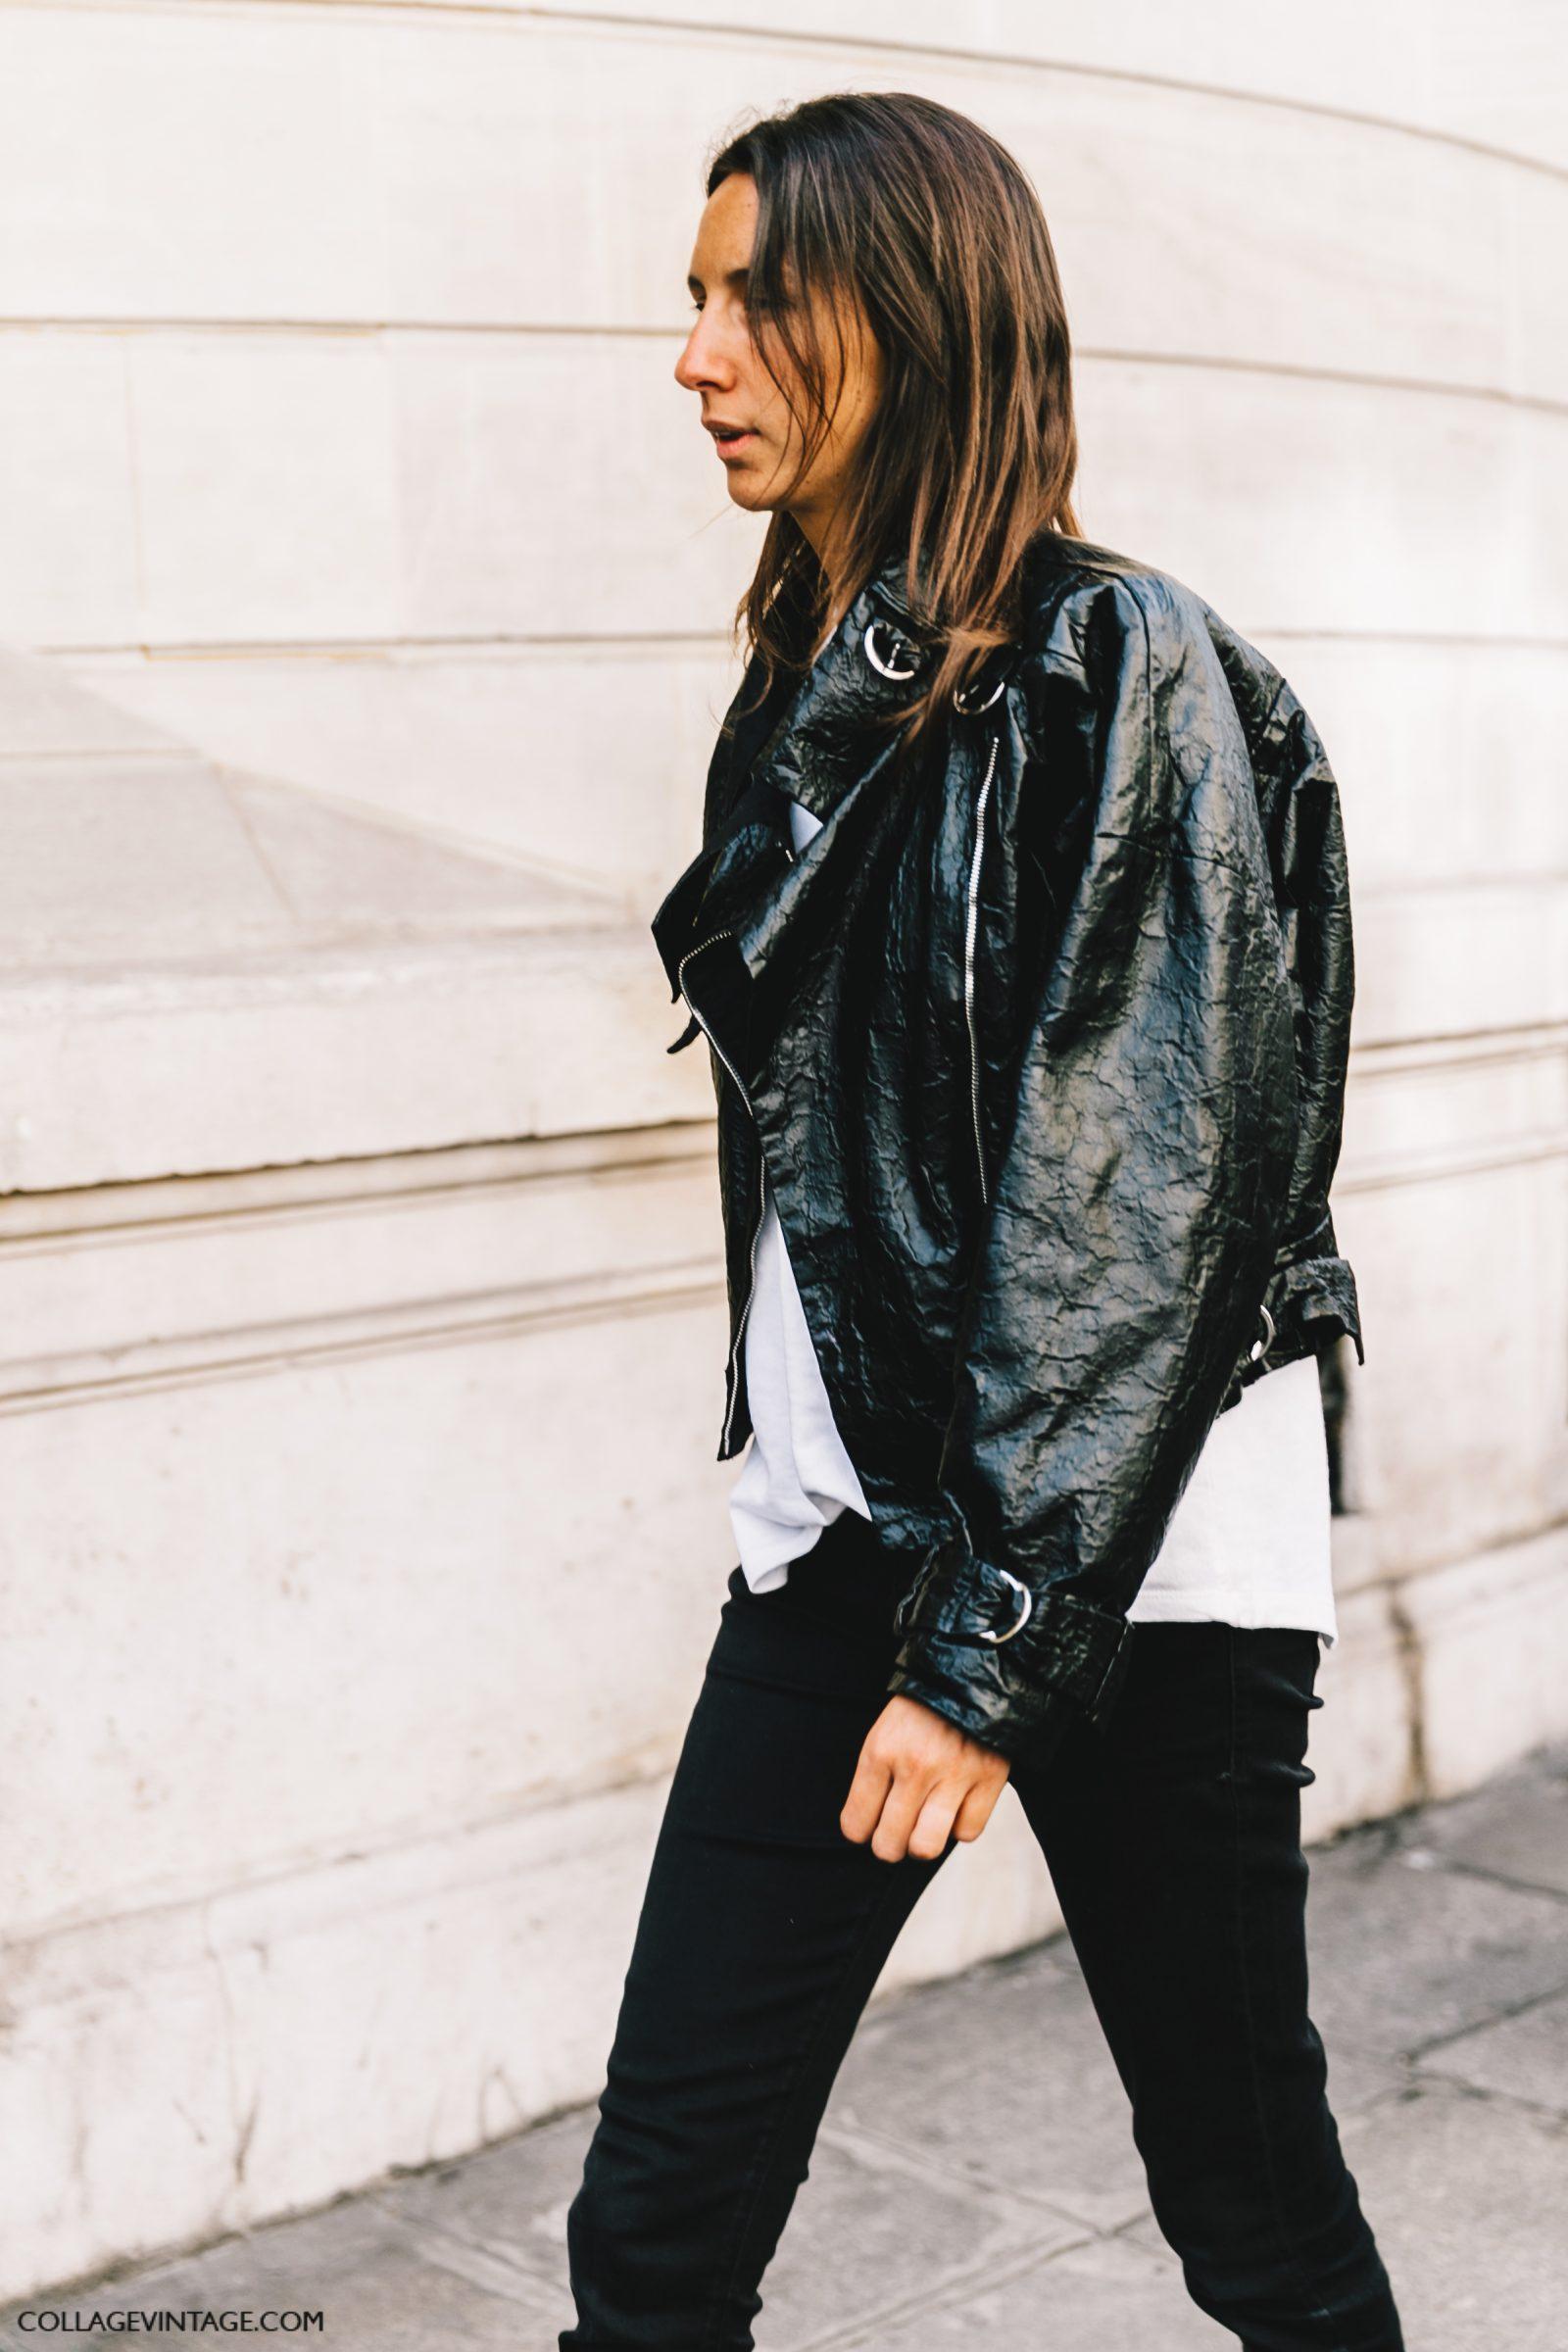 pfw-paris_fashion_week_ss17-street_style-outfits-collage_vintage-valentino-balenciaga-celine-119